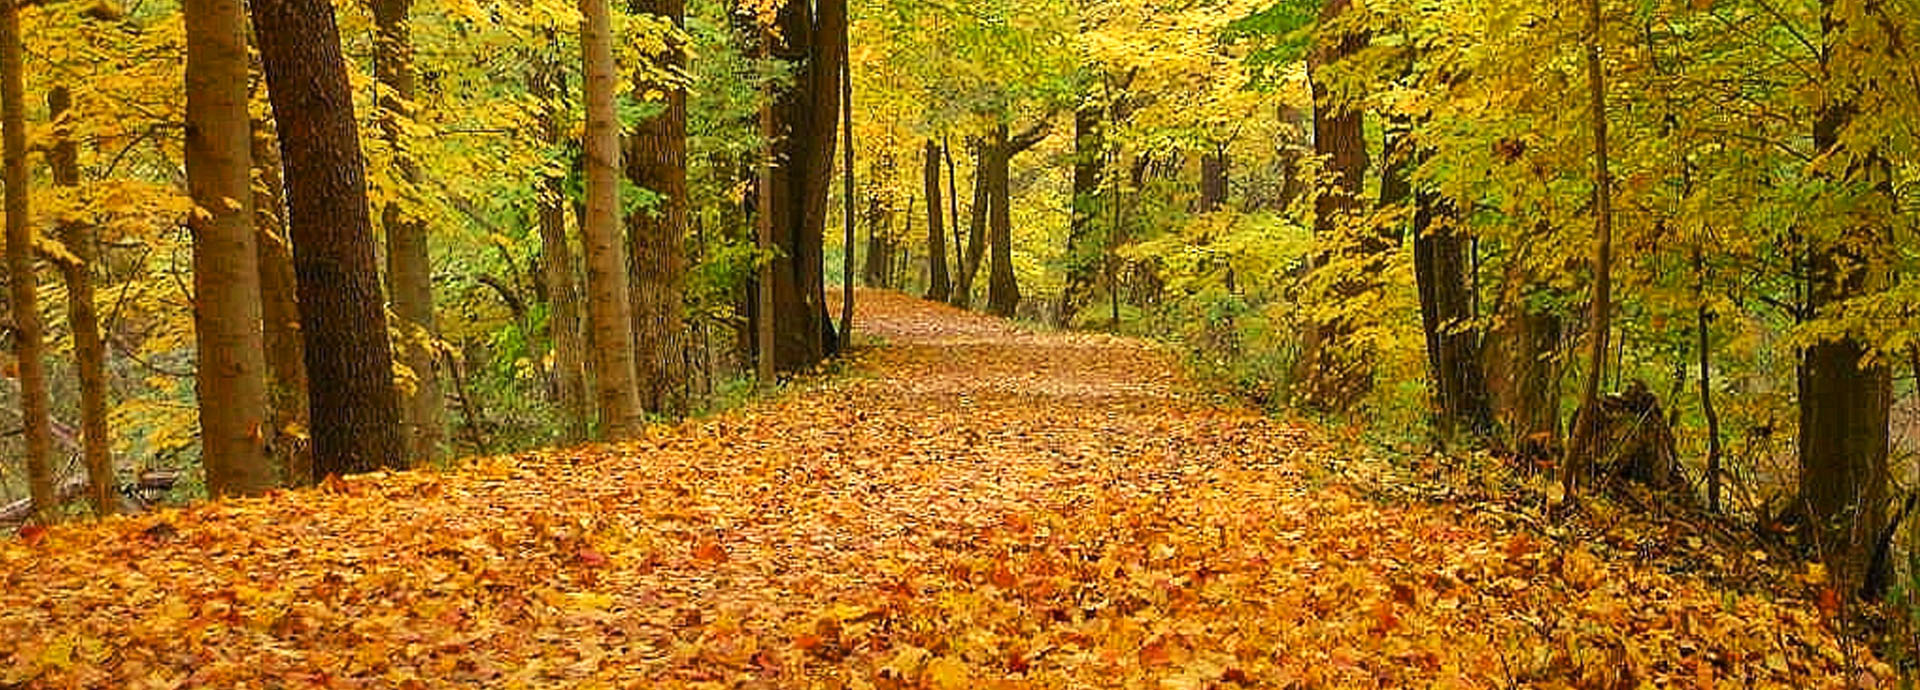 Medina County Fall Foliage Tour